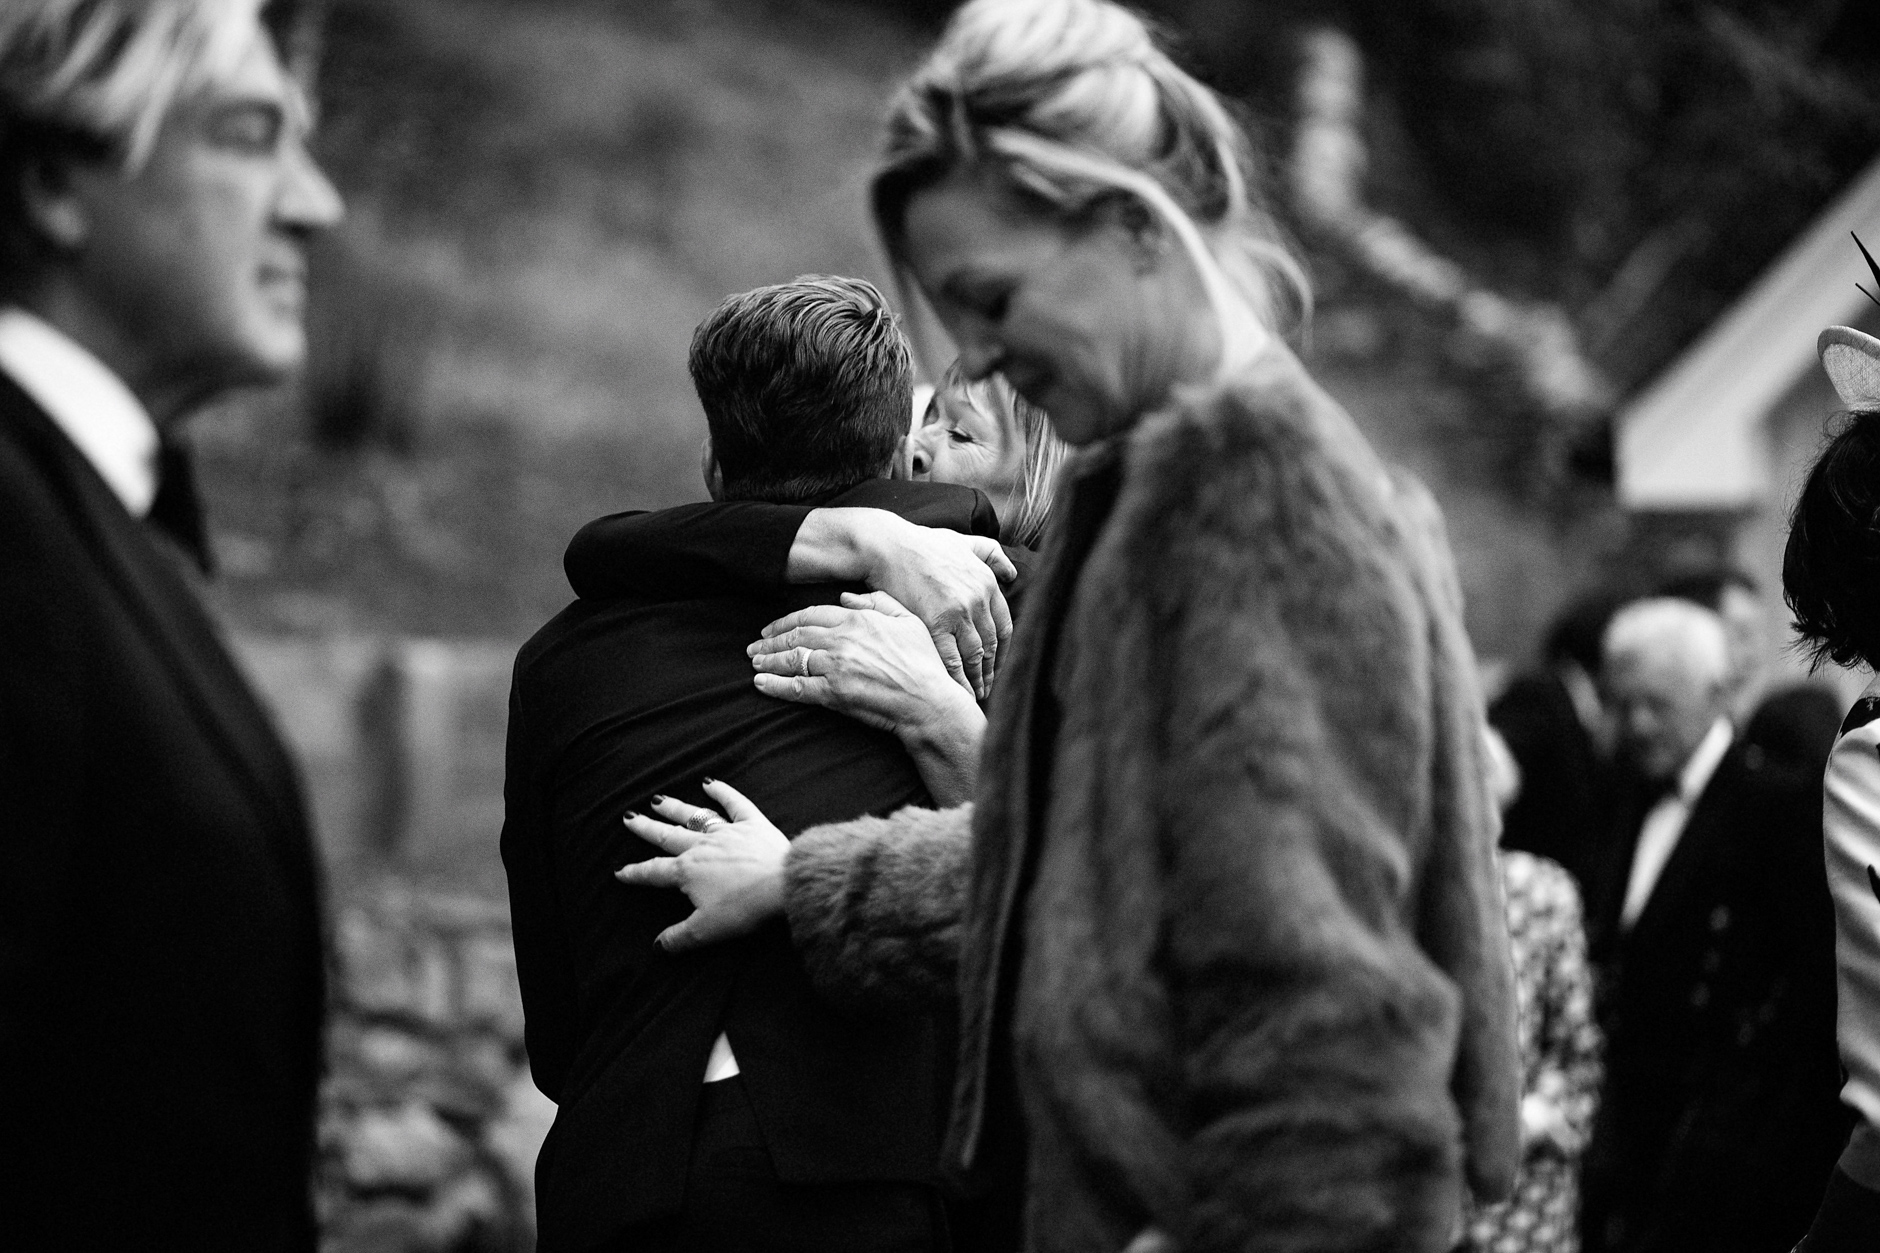 Glentruim-Wedding-Nikki-Leadbetter-Photography-133.jpg